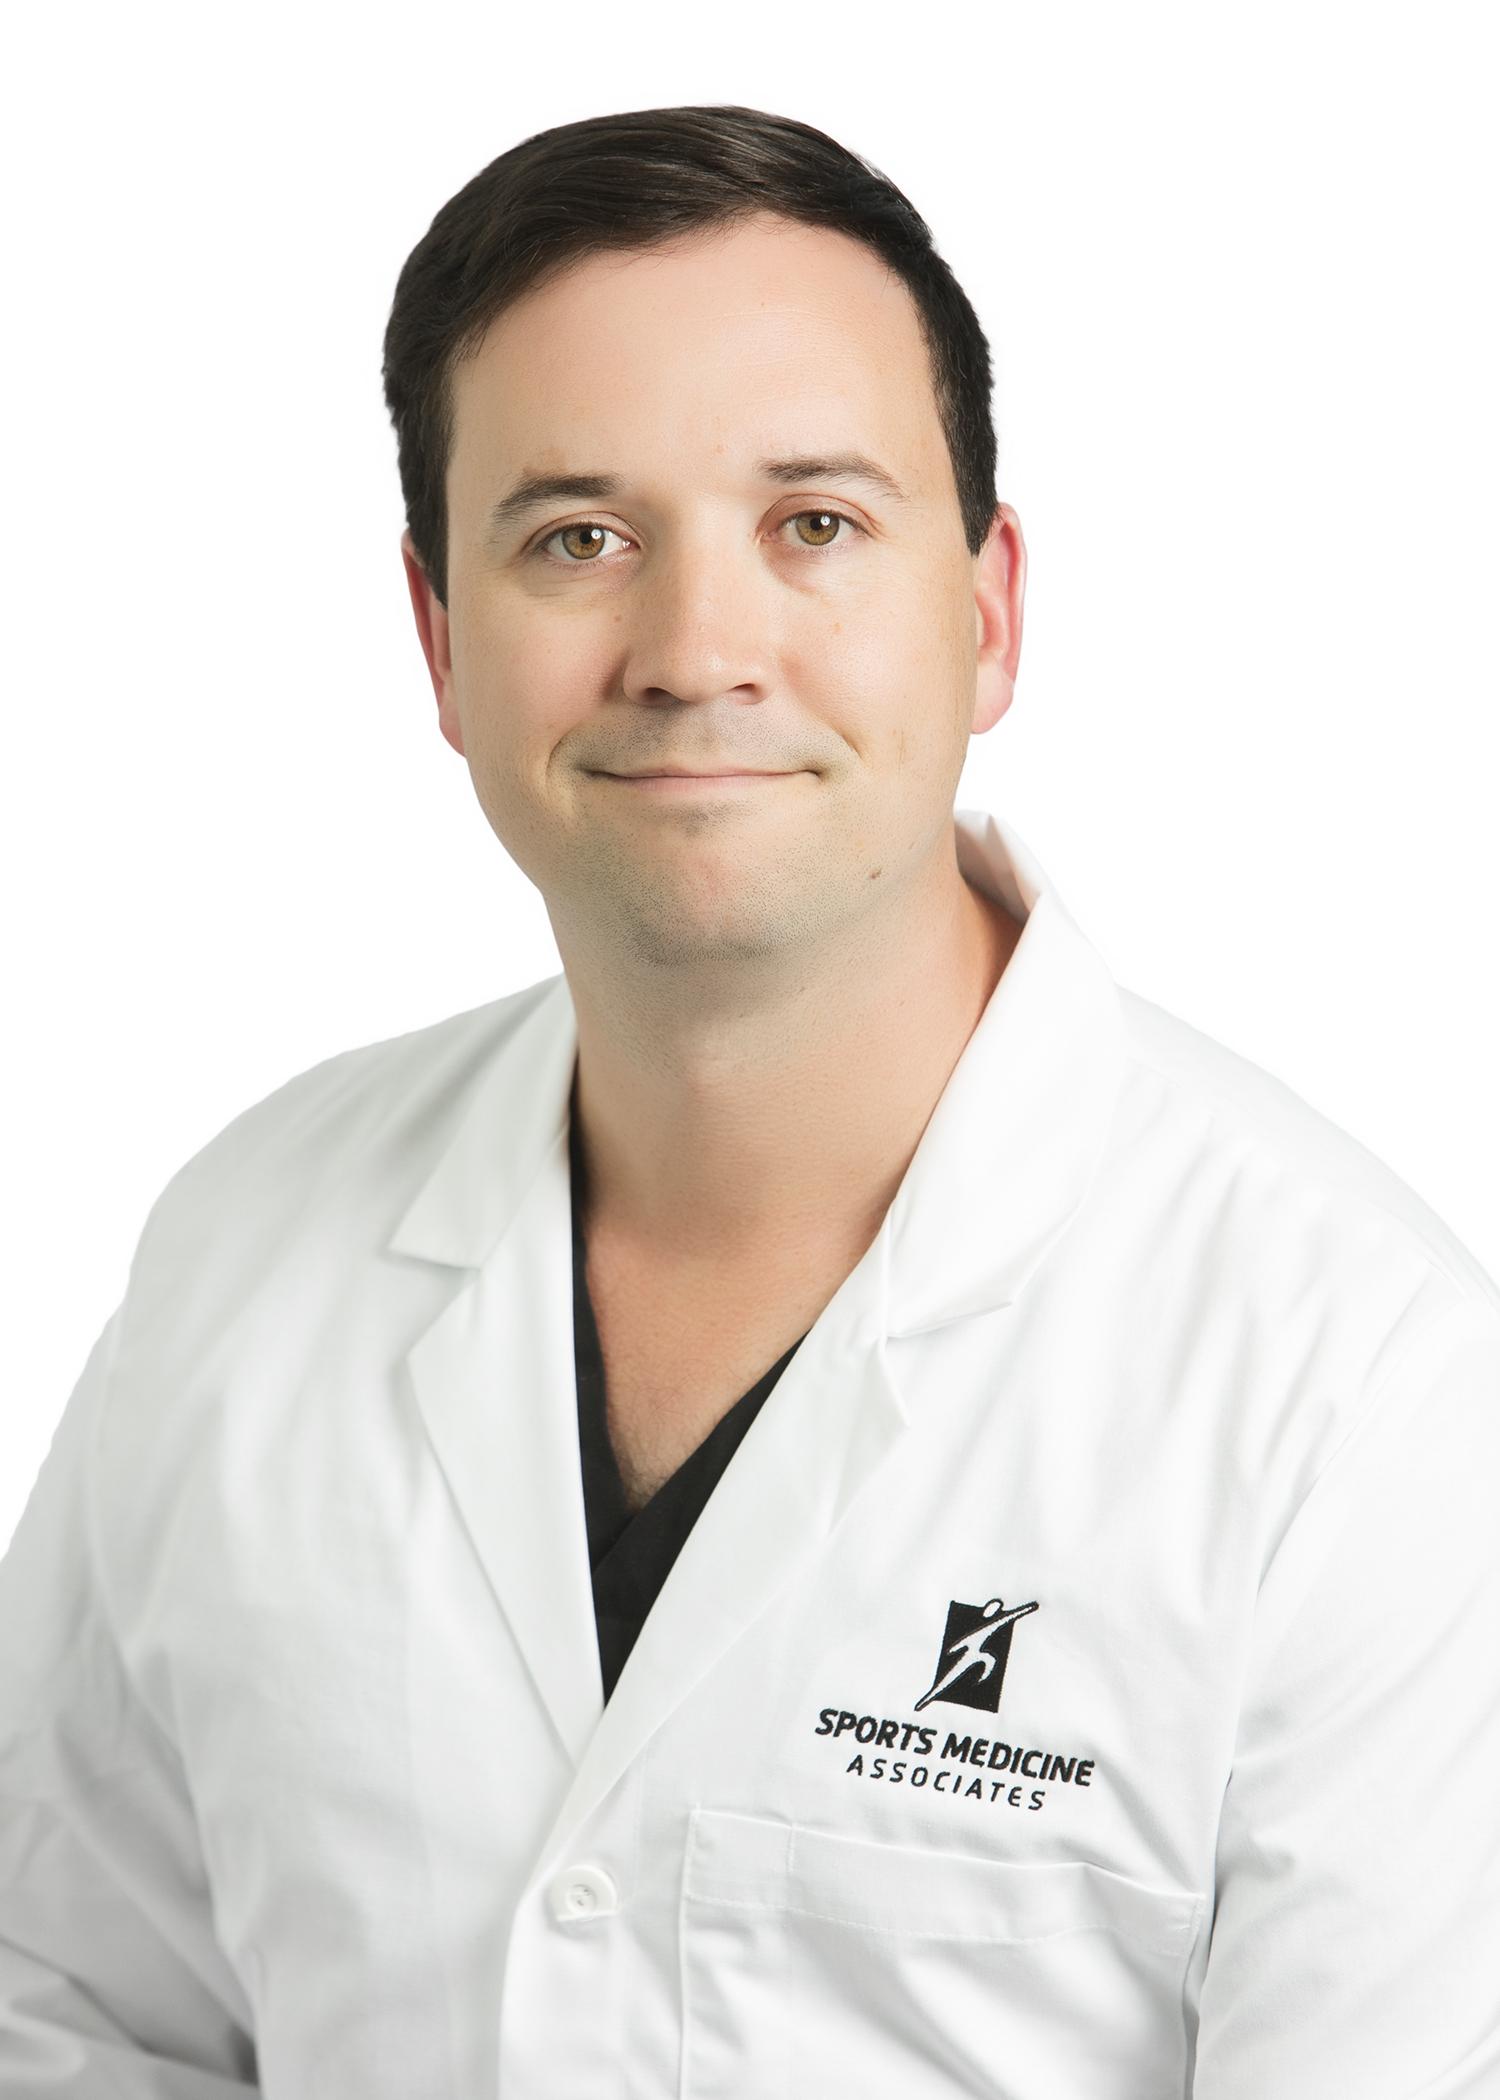 Robert Girling, M.D. - Board Certified Orthopedic Surgeon